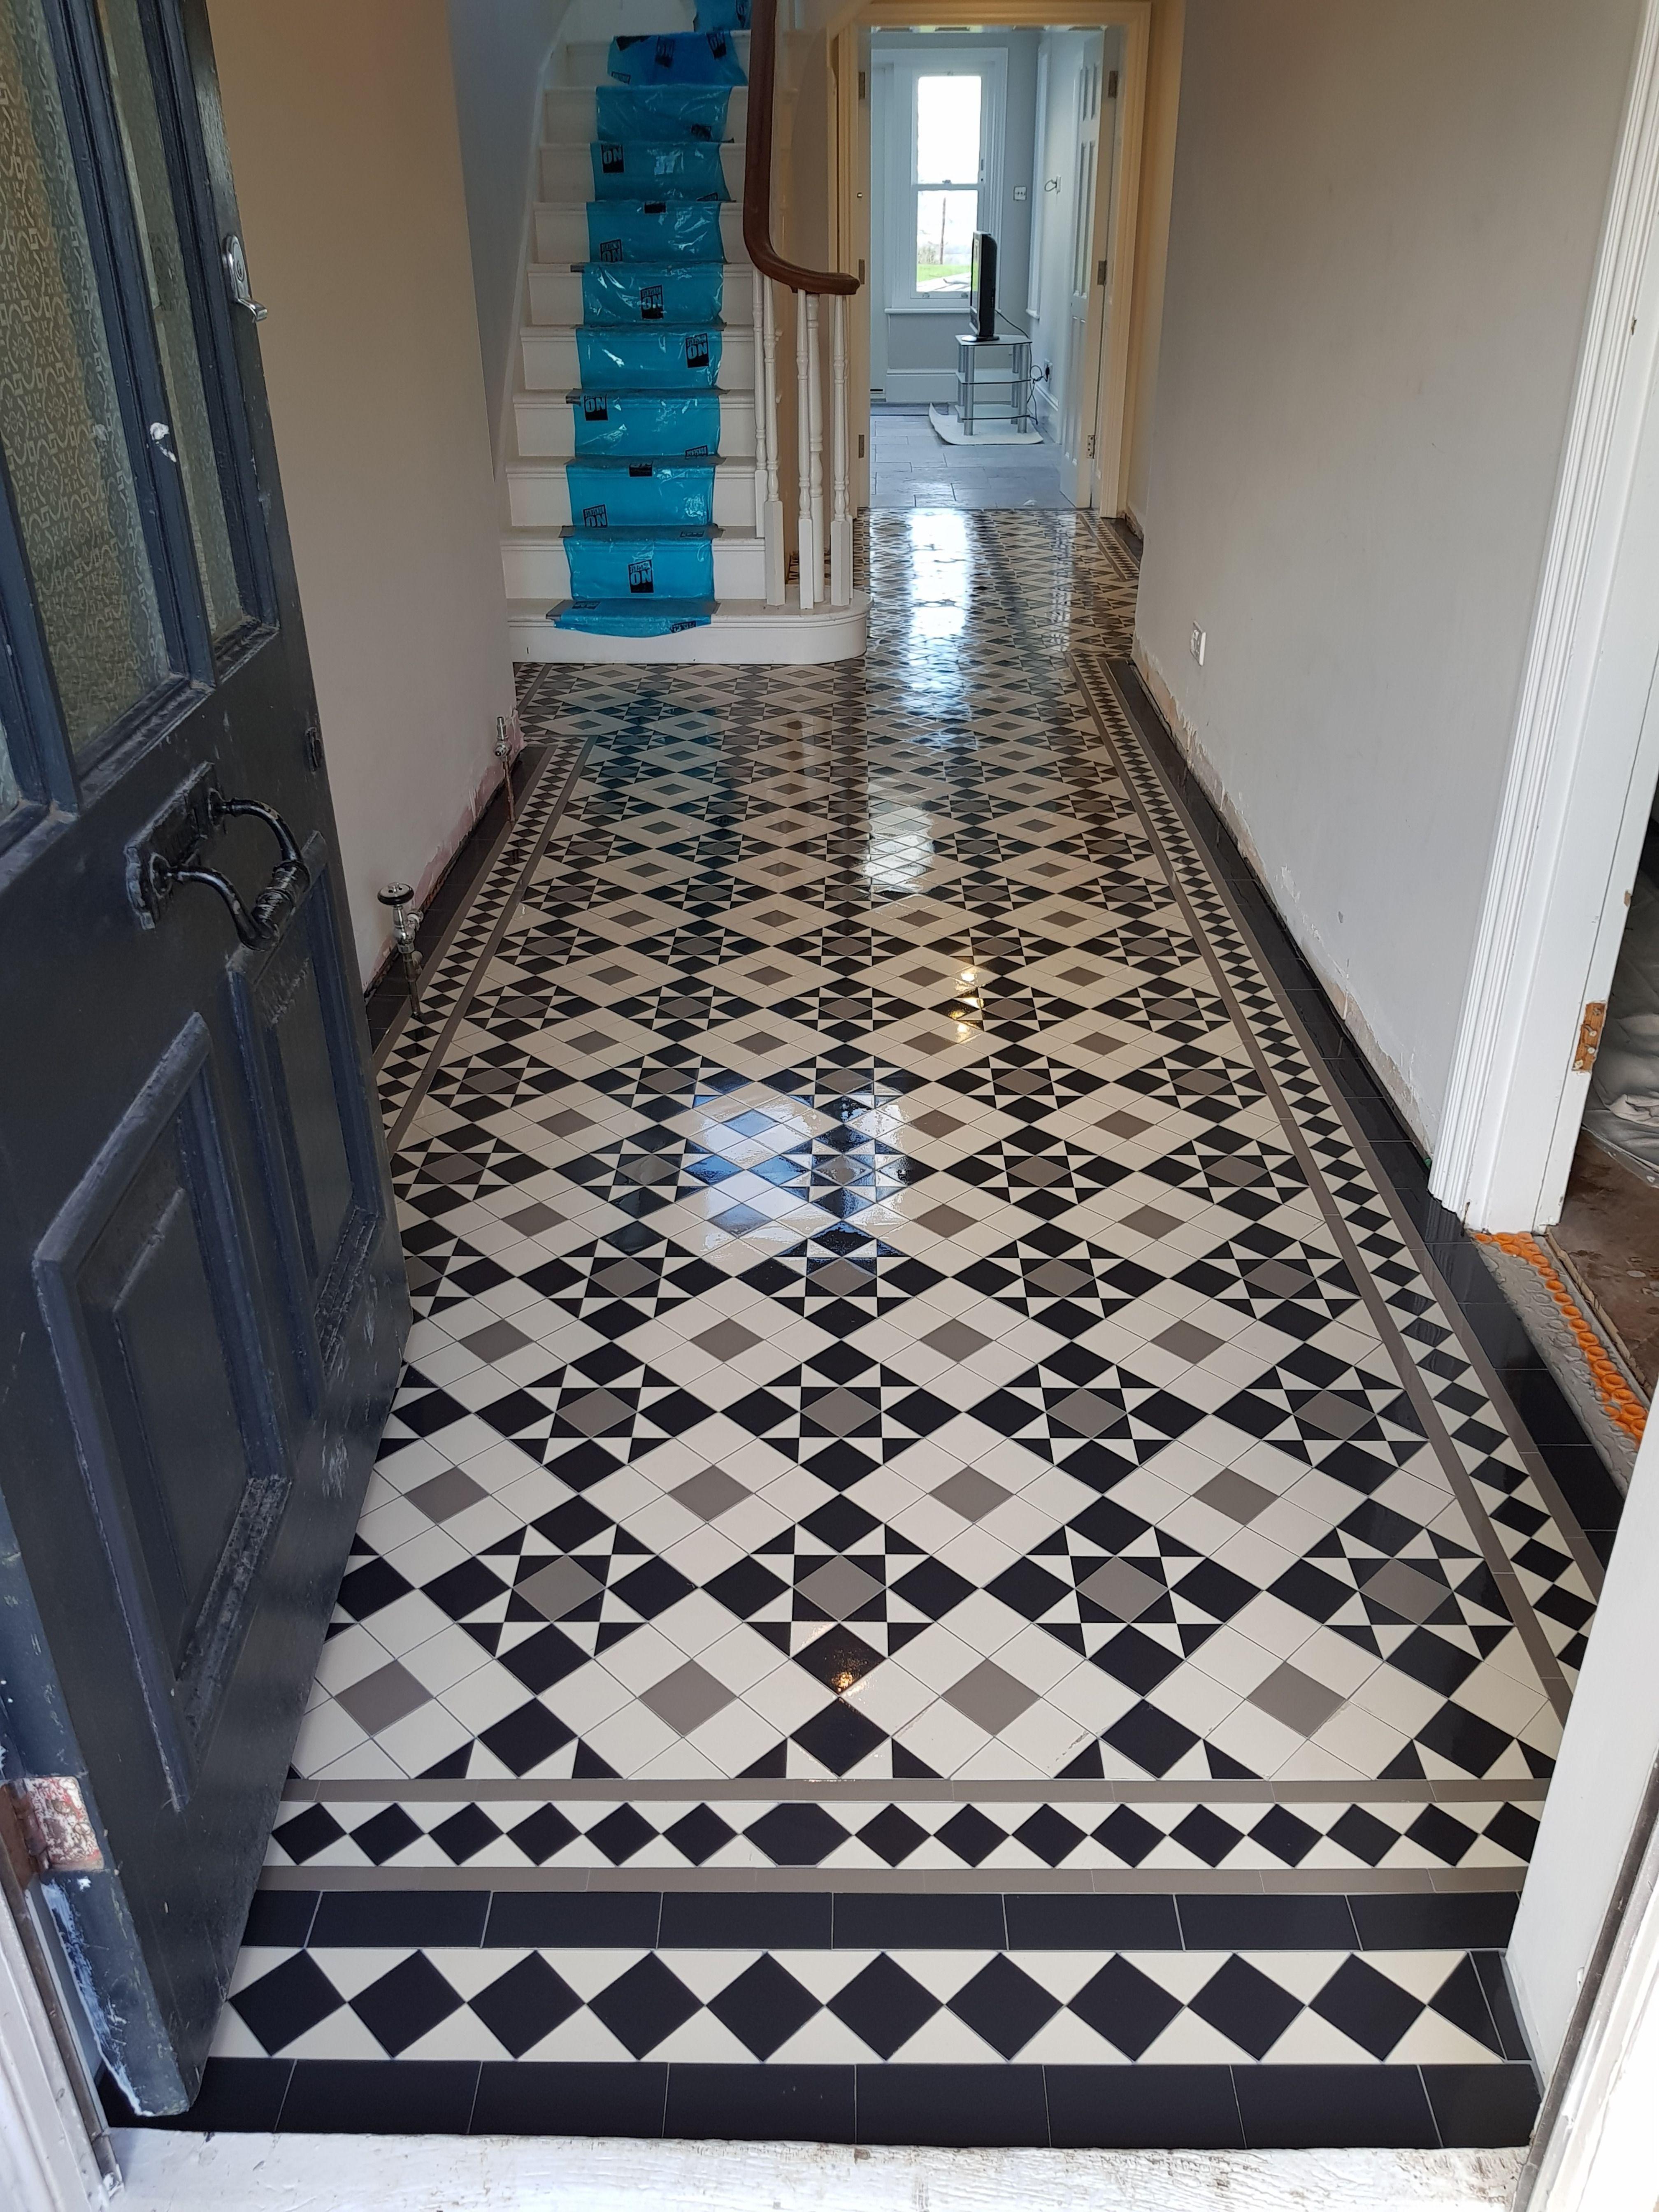 London Mosaic Victorian Floor Tiles Sheeted Ceramic Tile Design And Supply Floor Victorian Floor Ti In 2020 Victorian Hallway Tiled Hallway Victorian Hallway Tiles